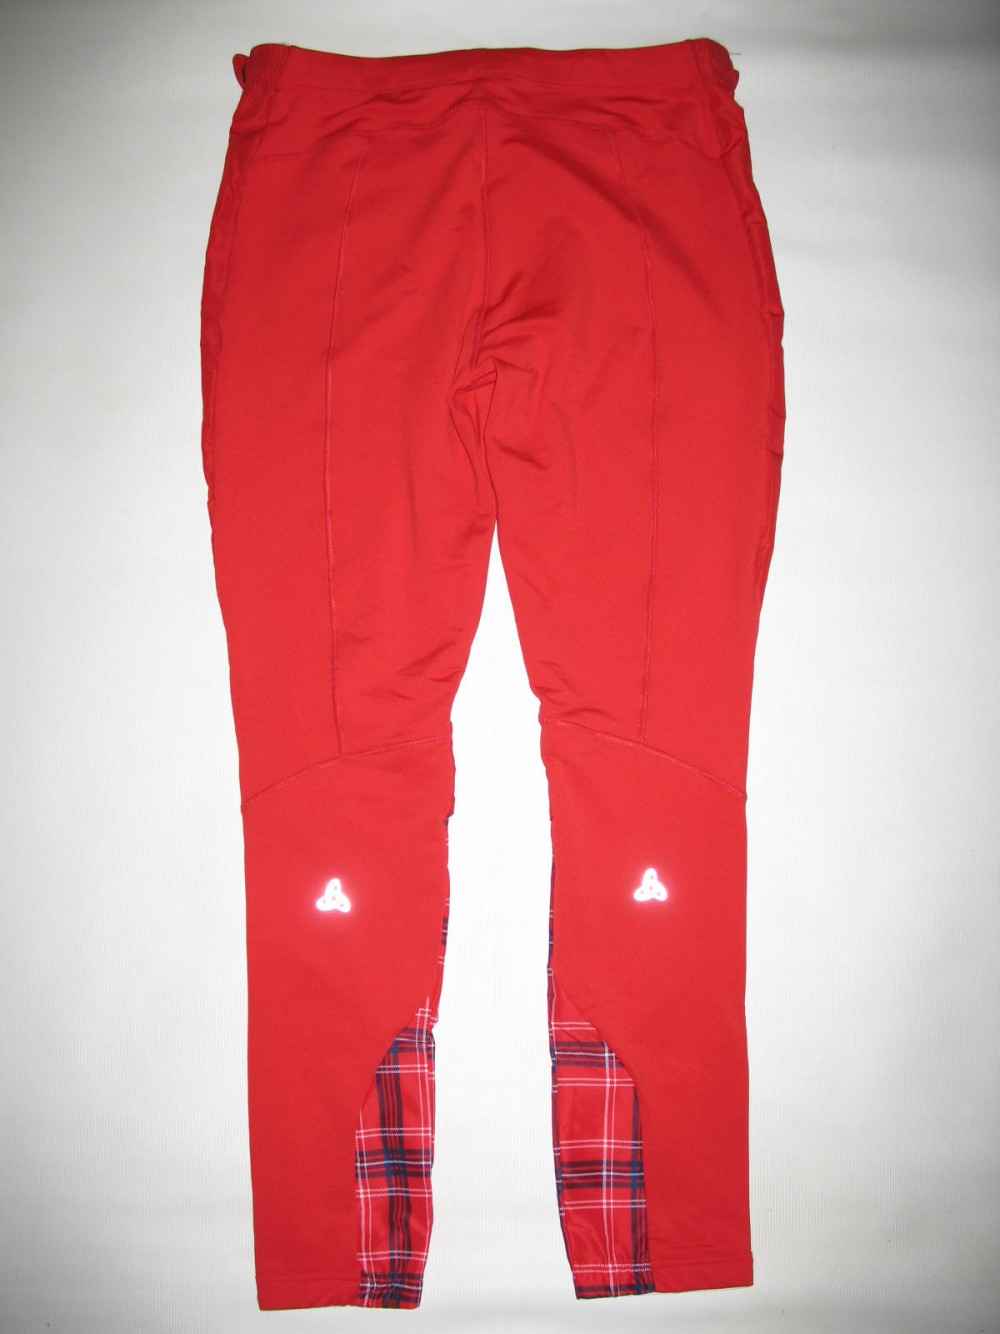 Штаны ODLO logic windproof pants (размер L) - 2